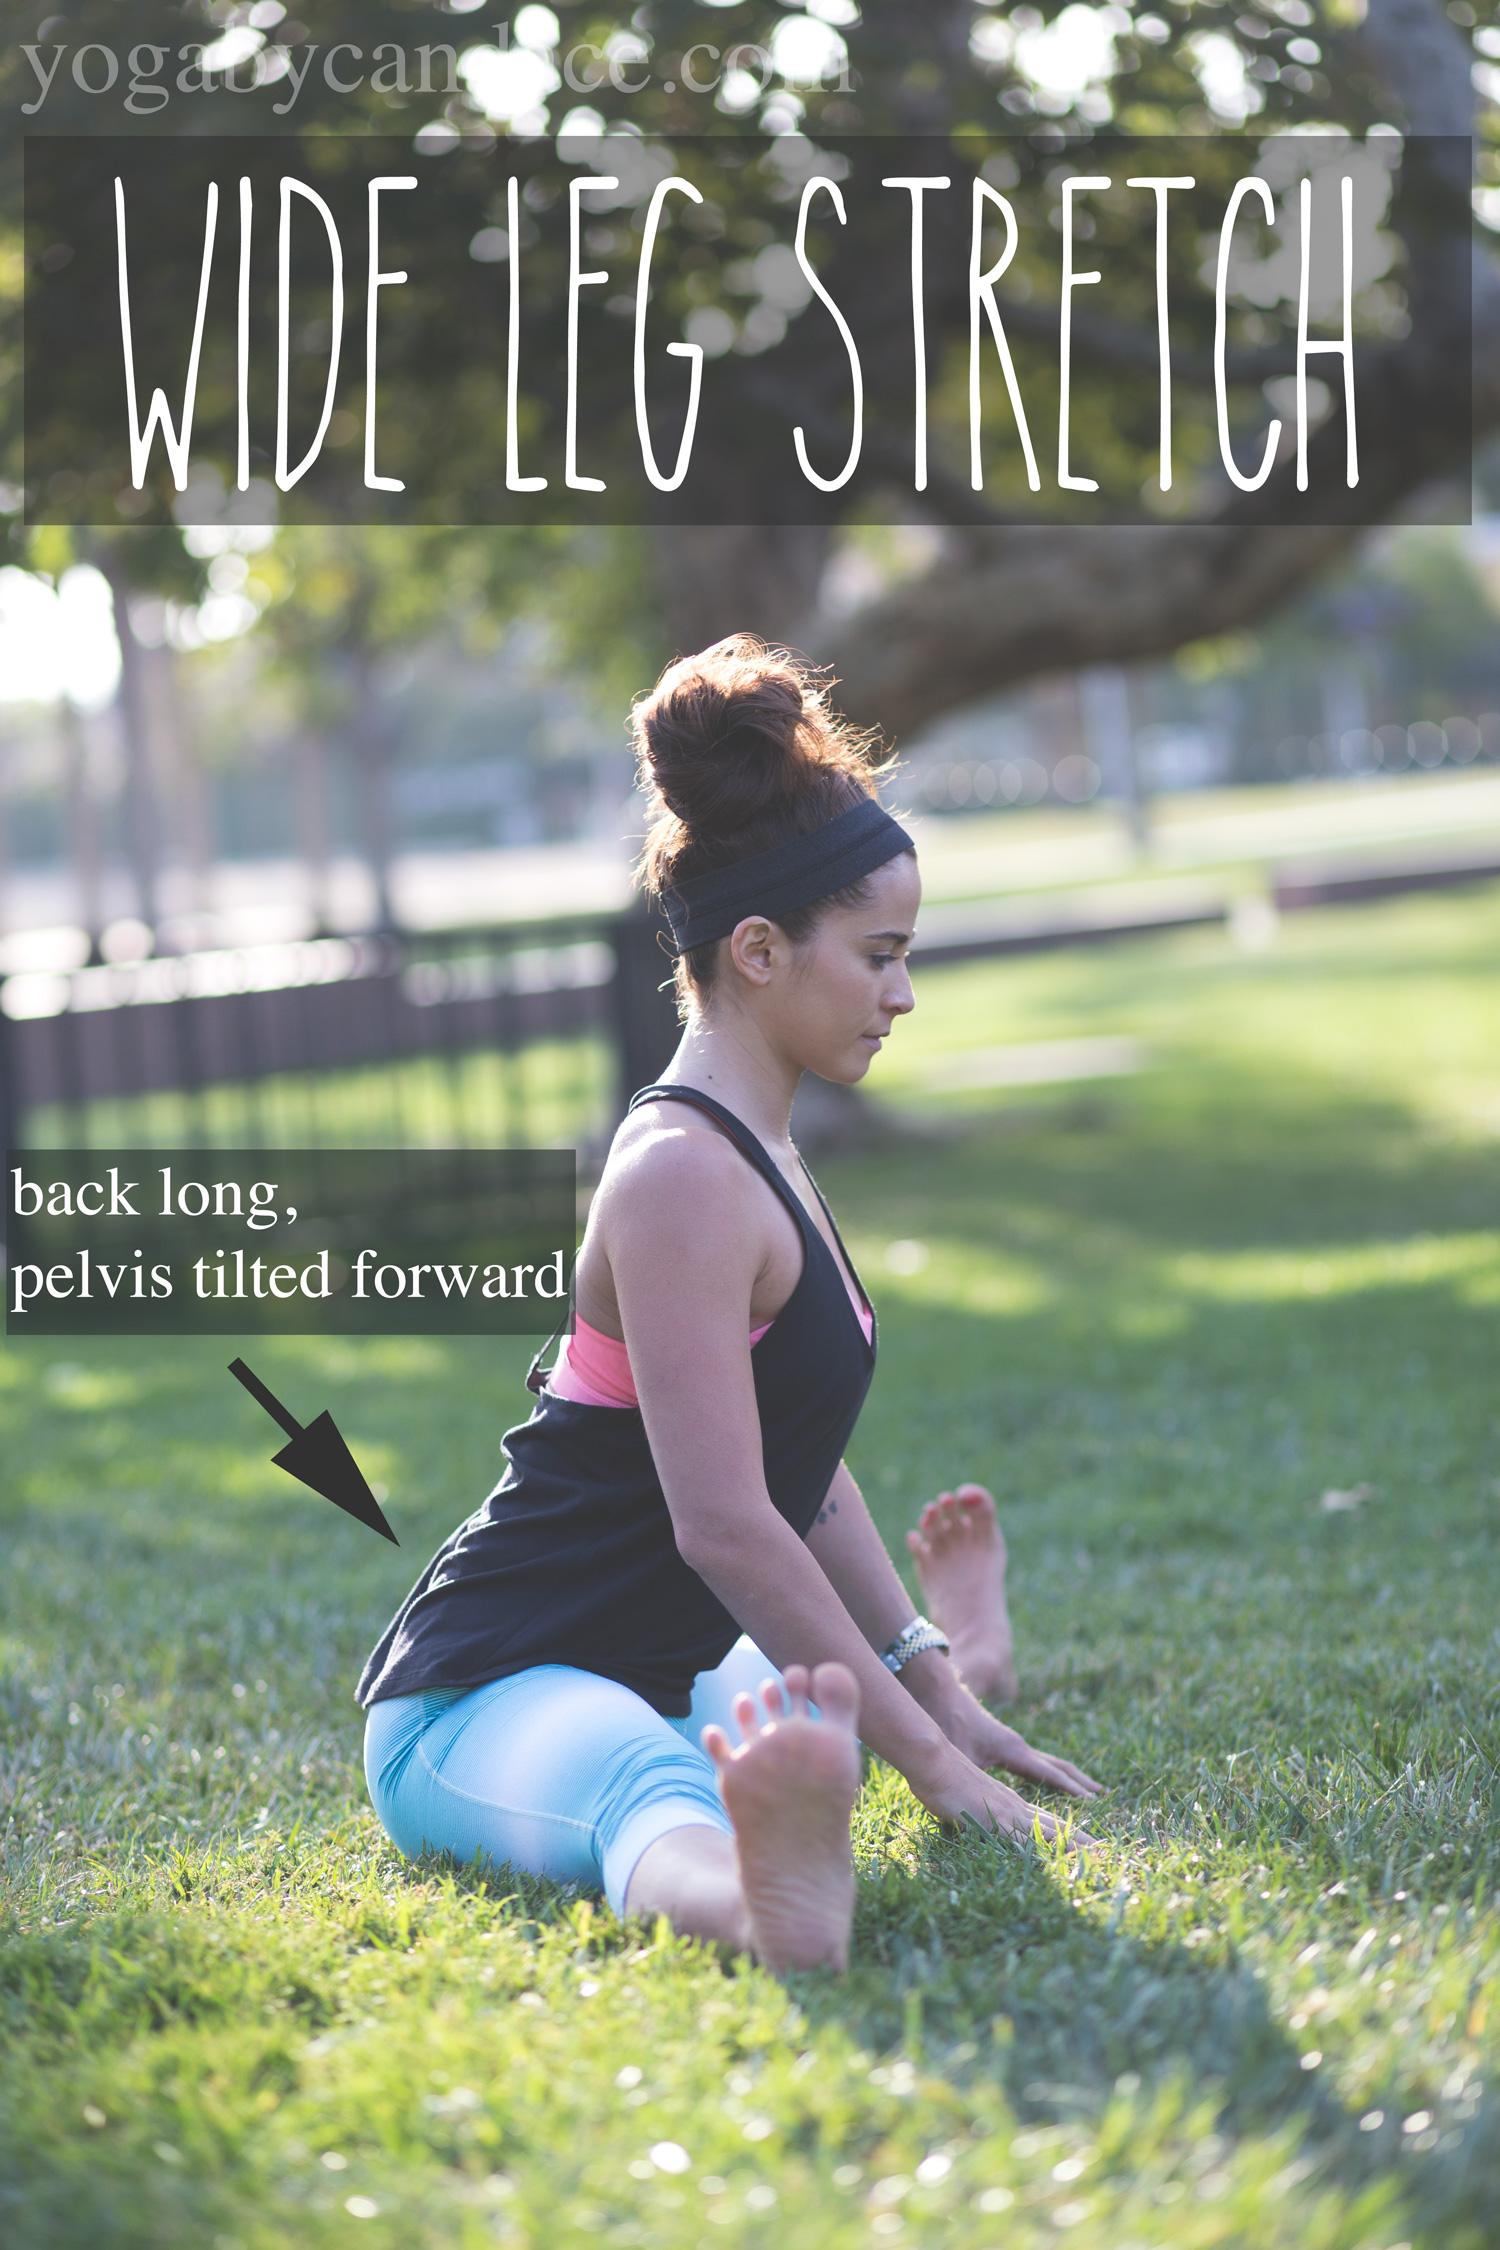 Wide leg stretch